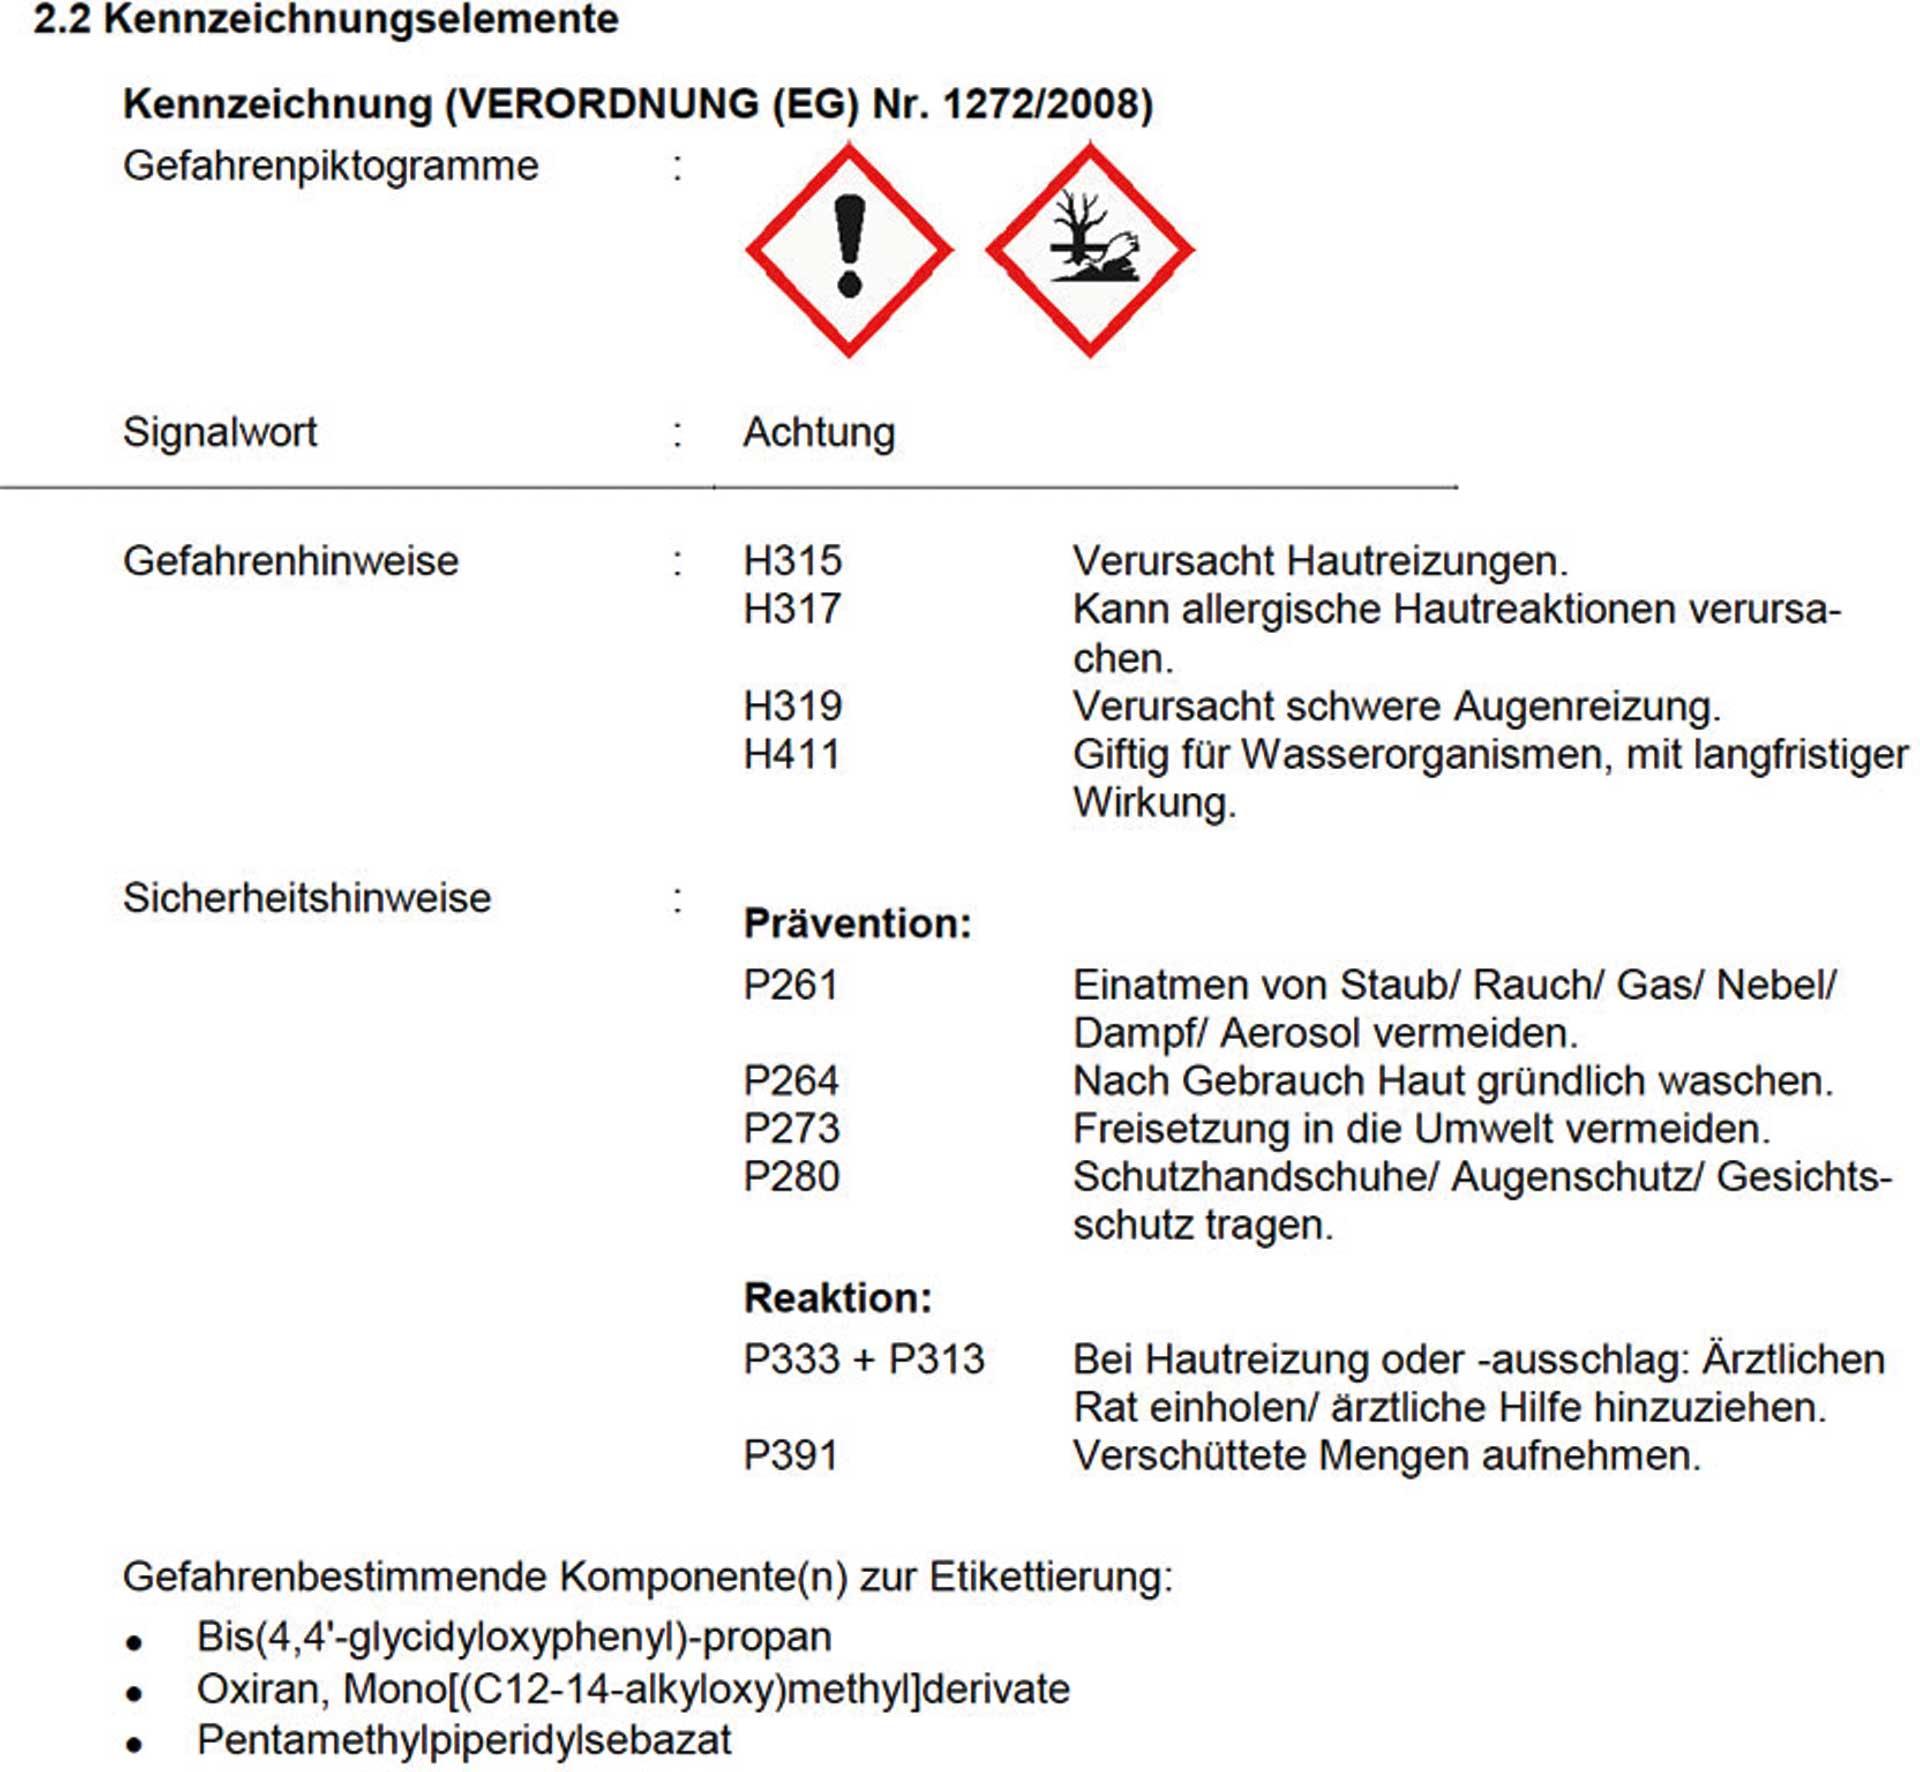 R&G Epoxid-Gießharz KRISTALLKLAR, Kanister/ 10 kg